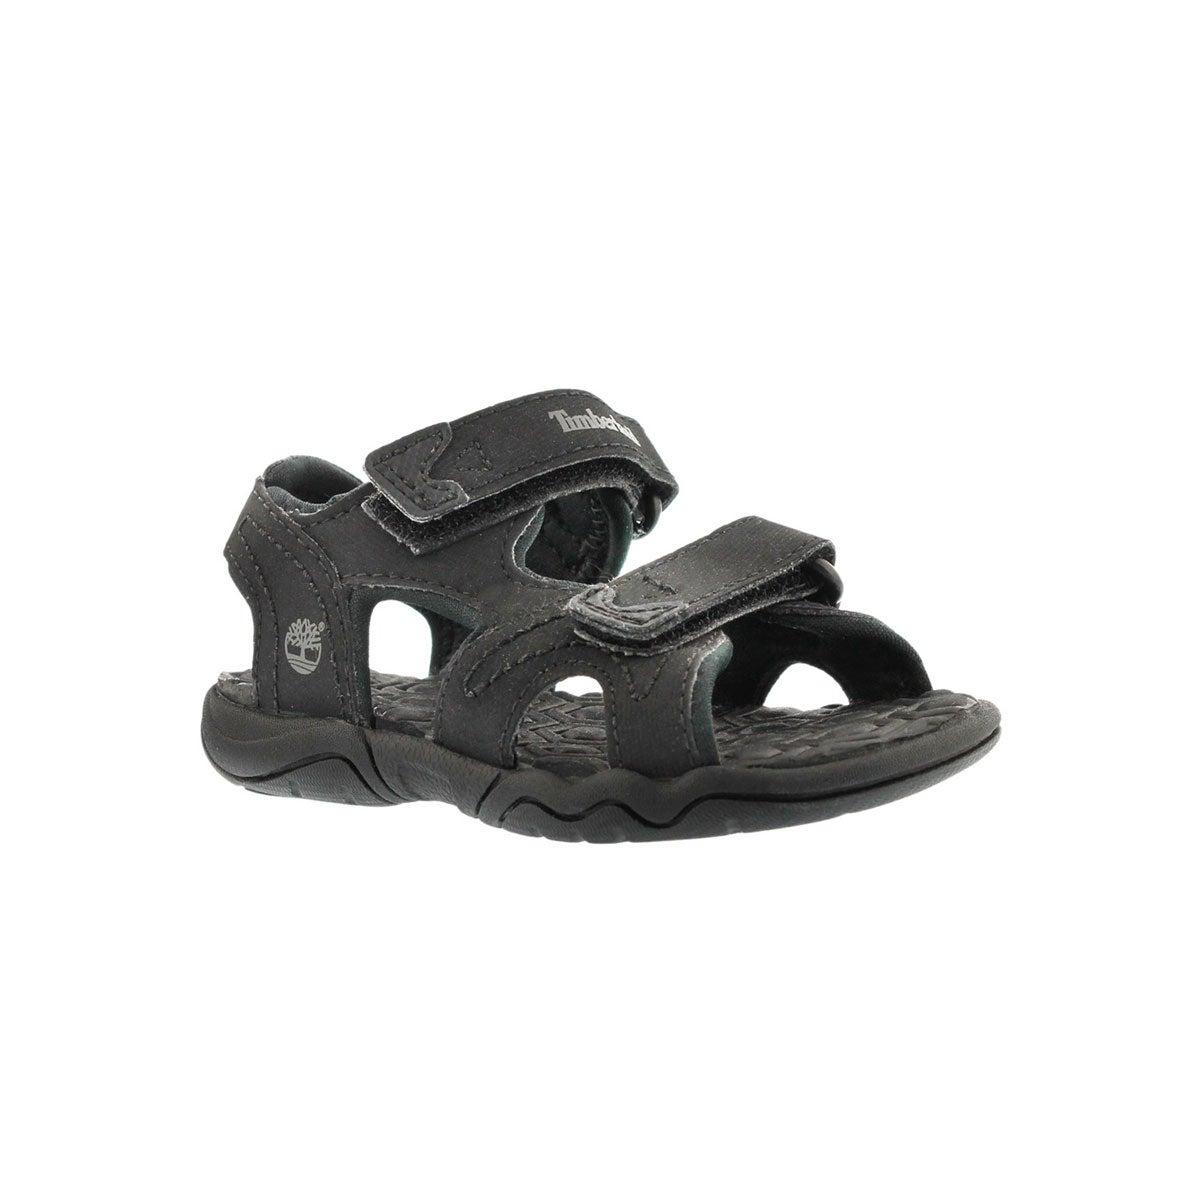 Inf Adventure Seeker black sport sandal